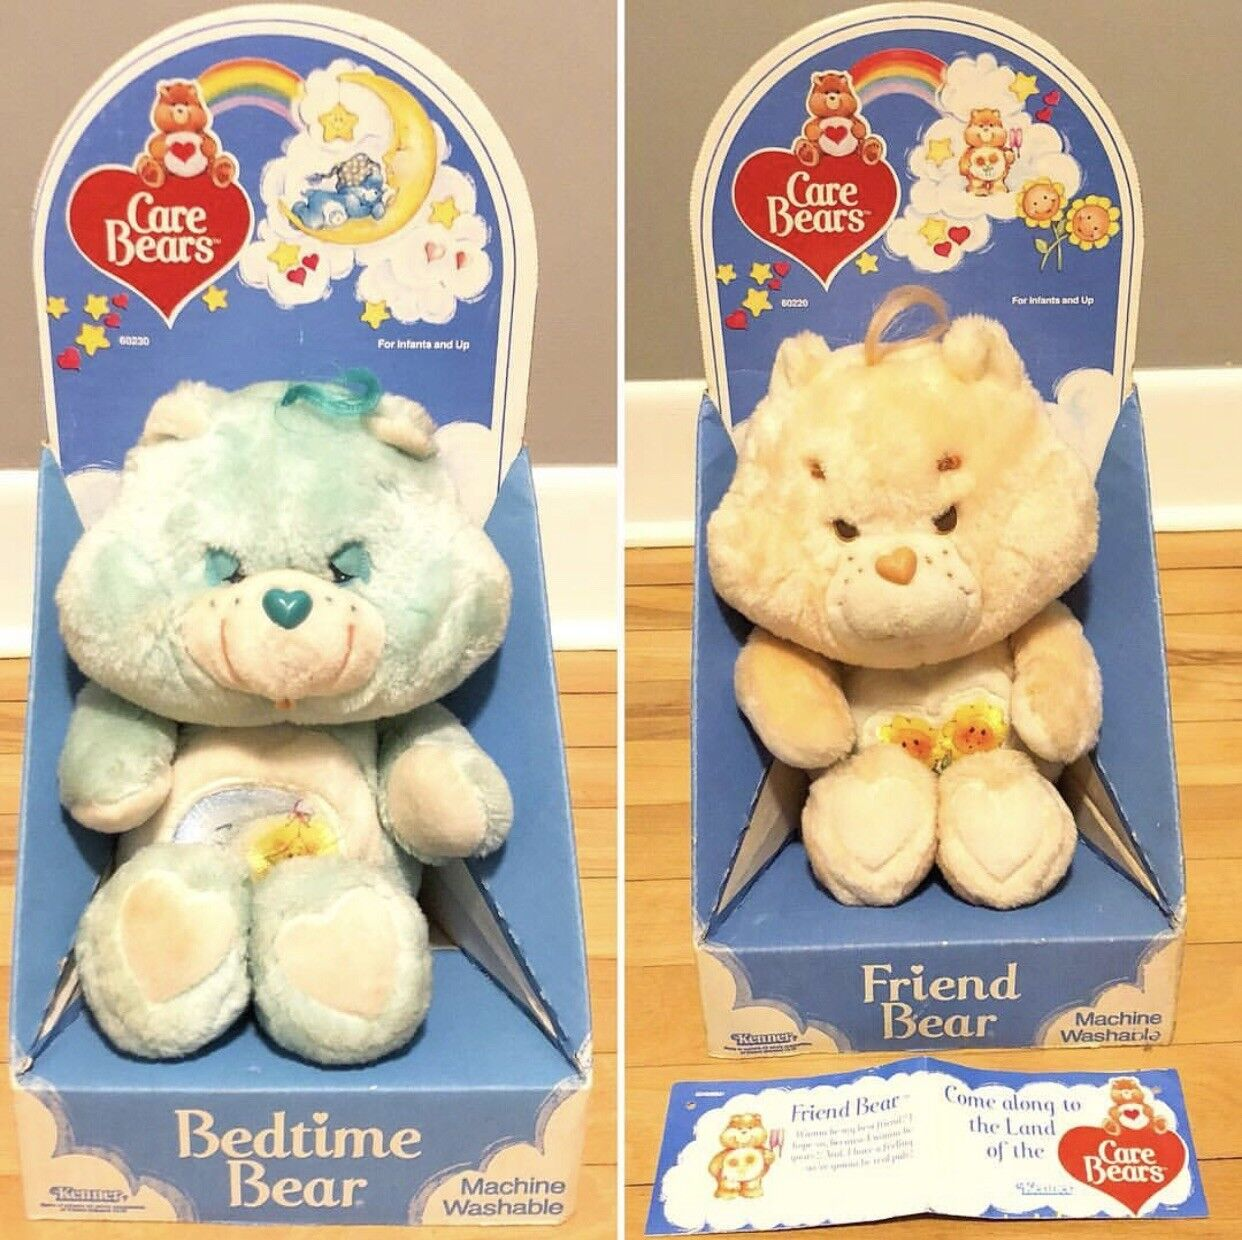 Care Bears FRIEND BEDTIME Bear PLUSH 1985 Vintage Kenner American Greetings Doll